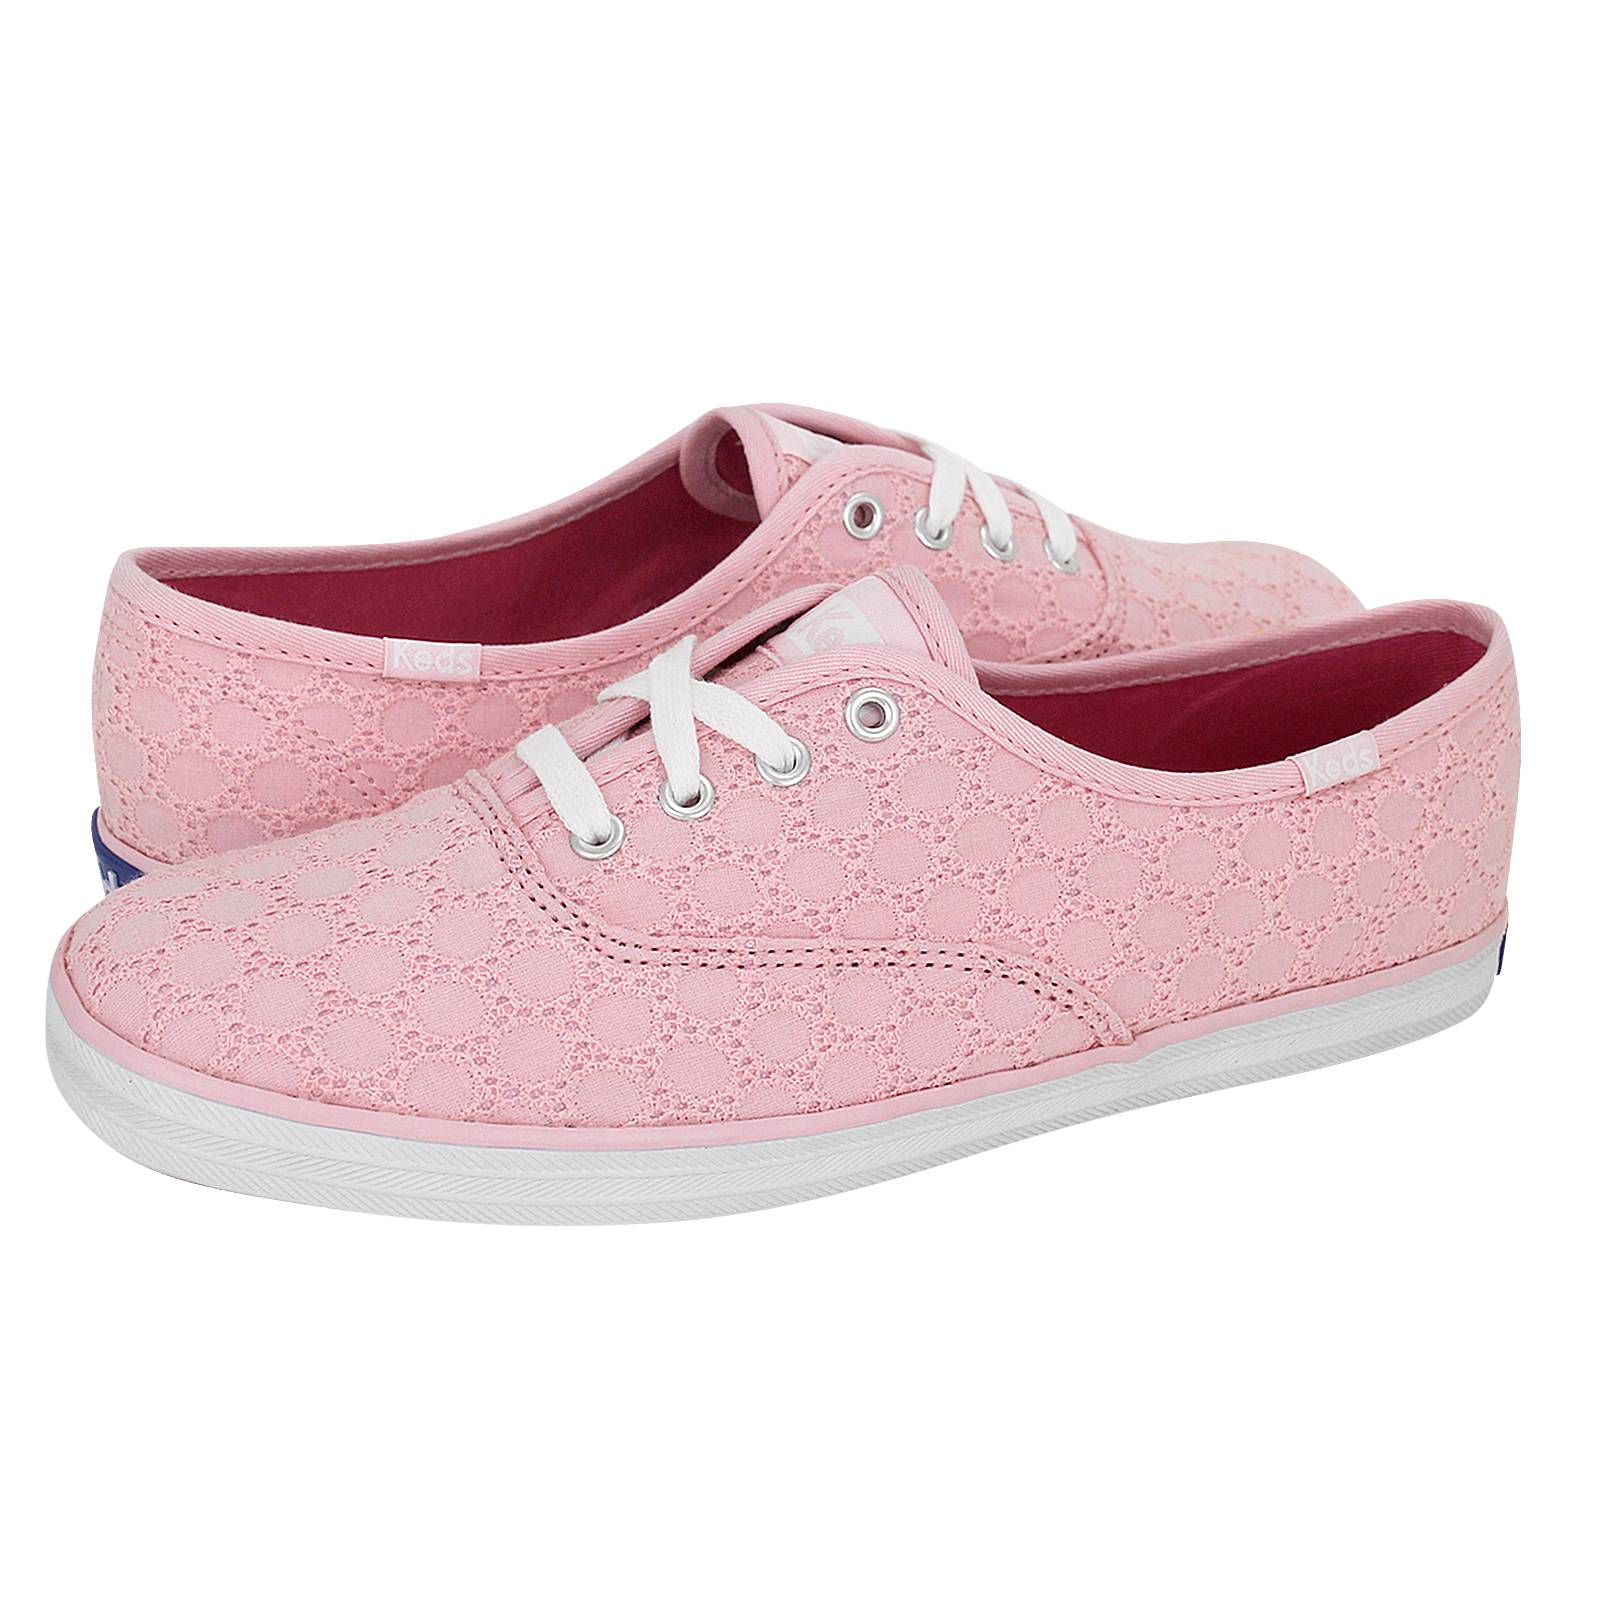 Champion Eyelet - Γυναικεία παπούτσια casual Keds από υφασμα ... a1a747726c2